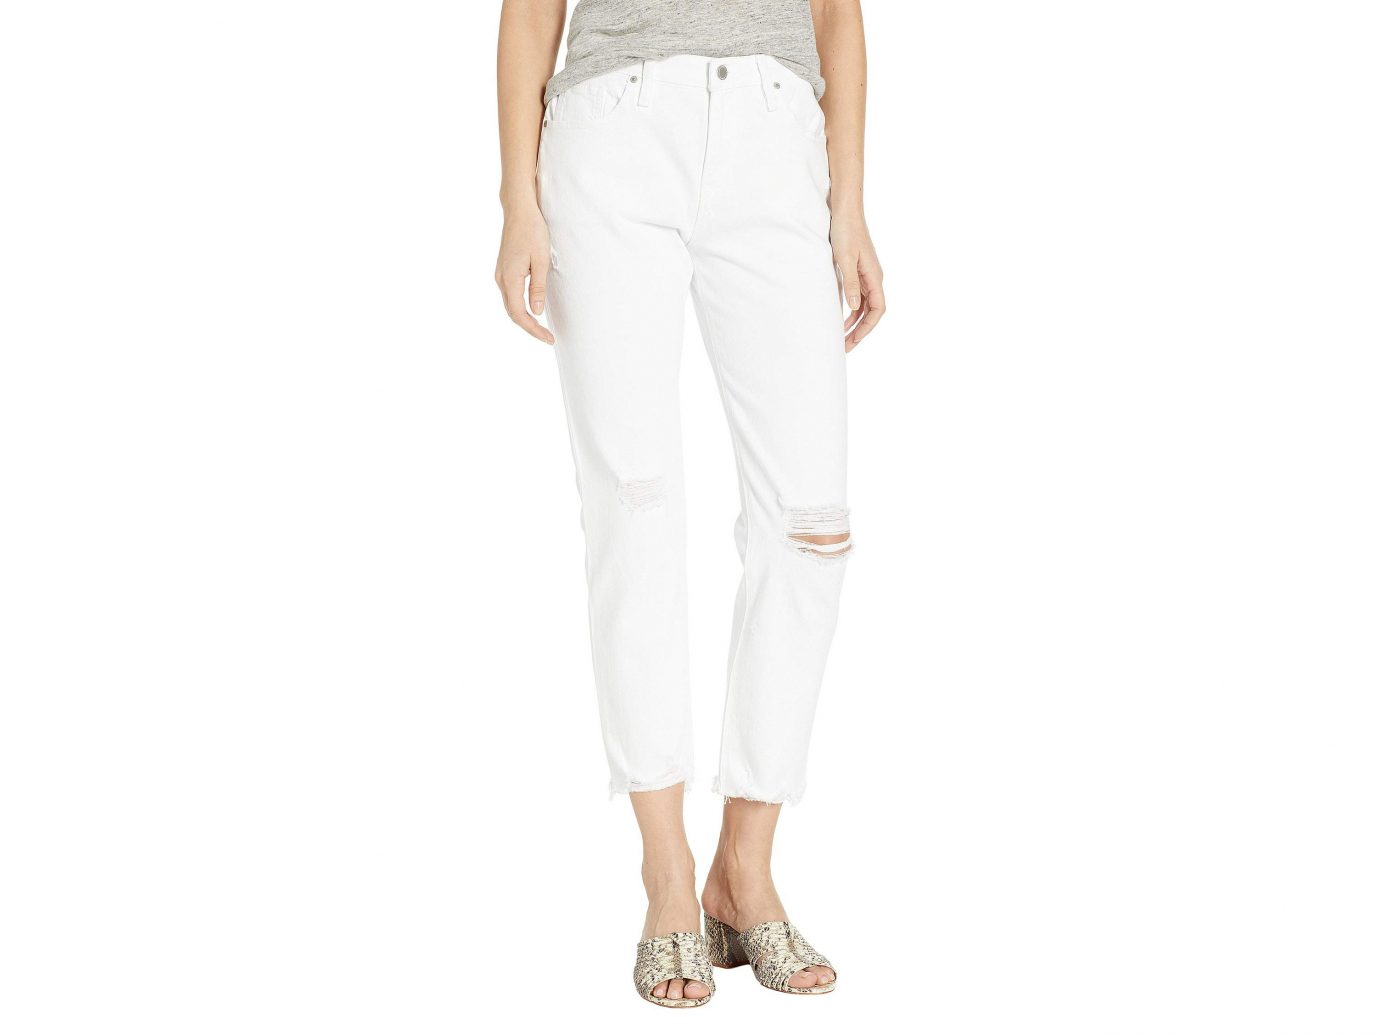 Hudson Jeans Jessi Relaxed Cropped Boyfriend Five-Pocket Jeans